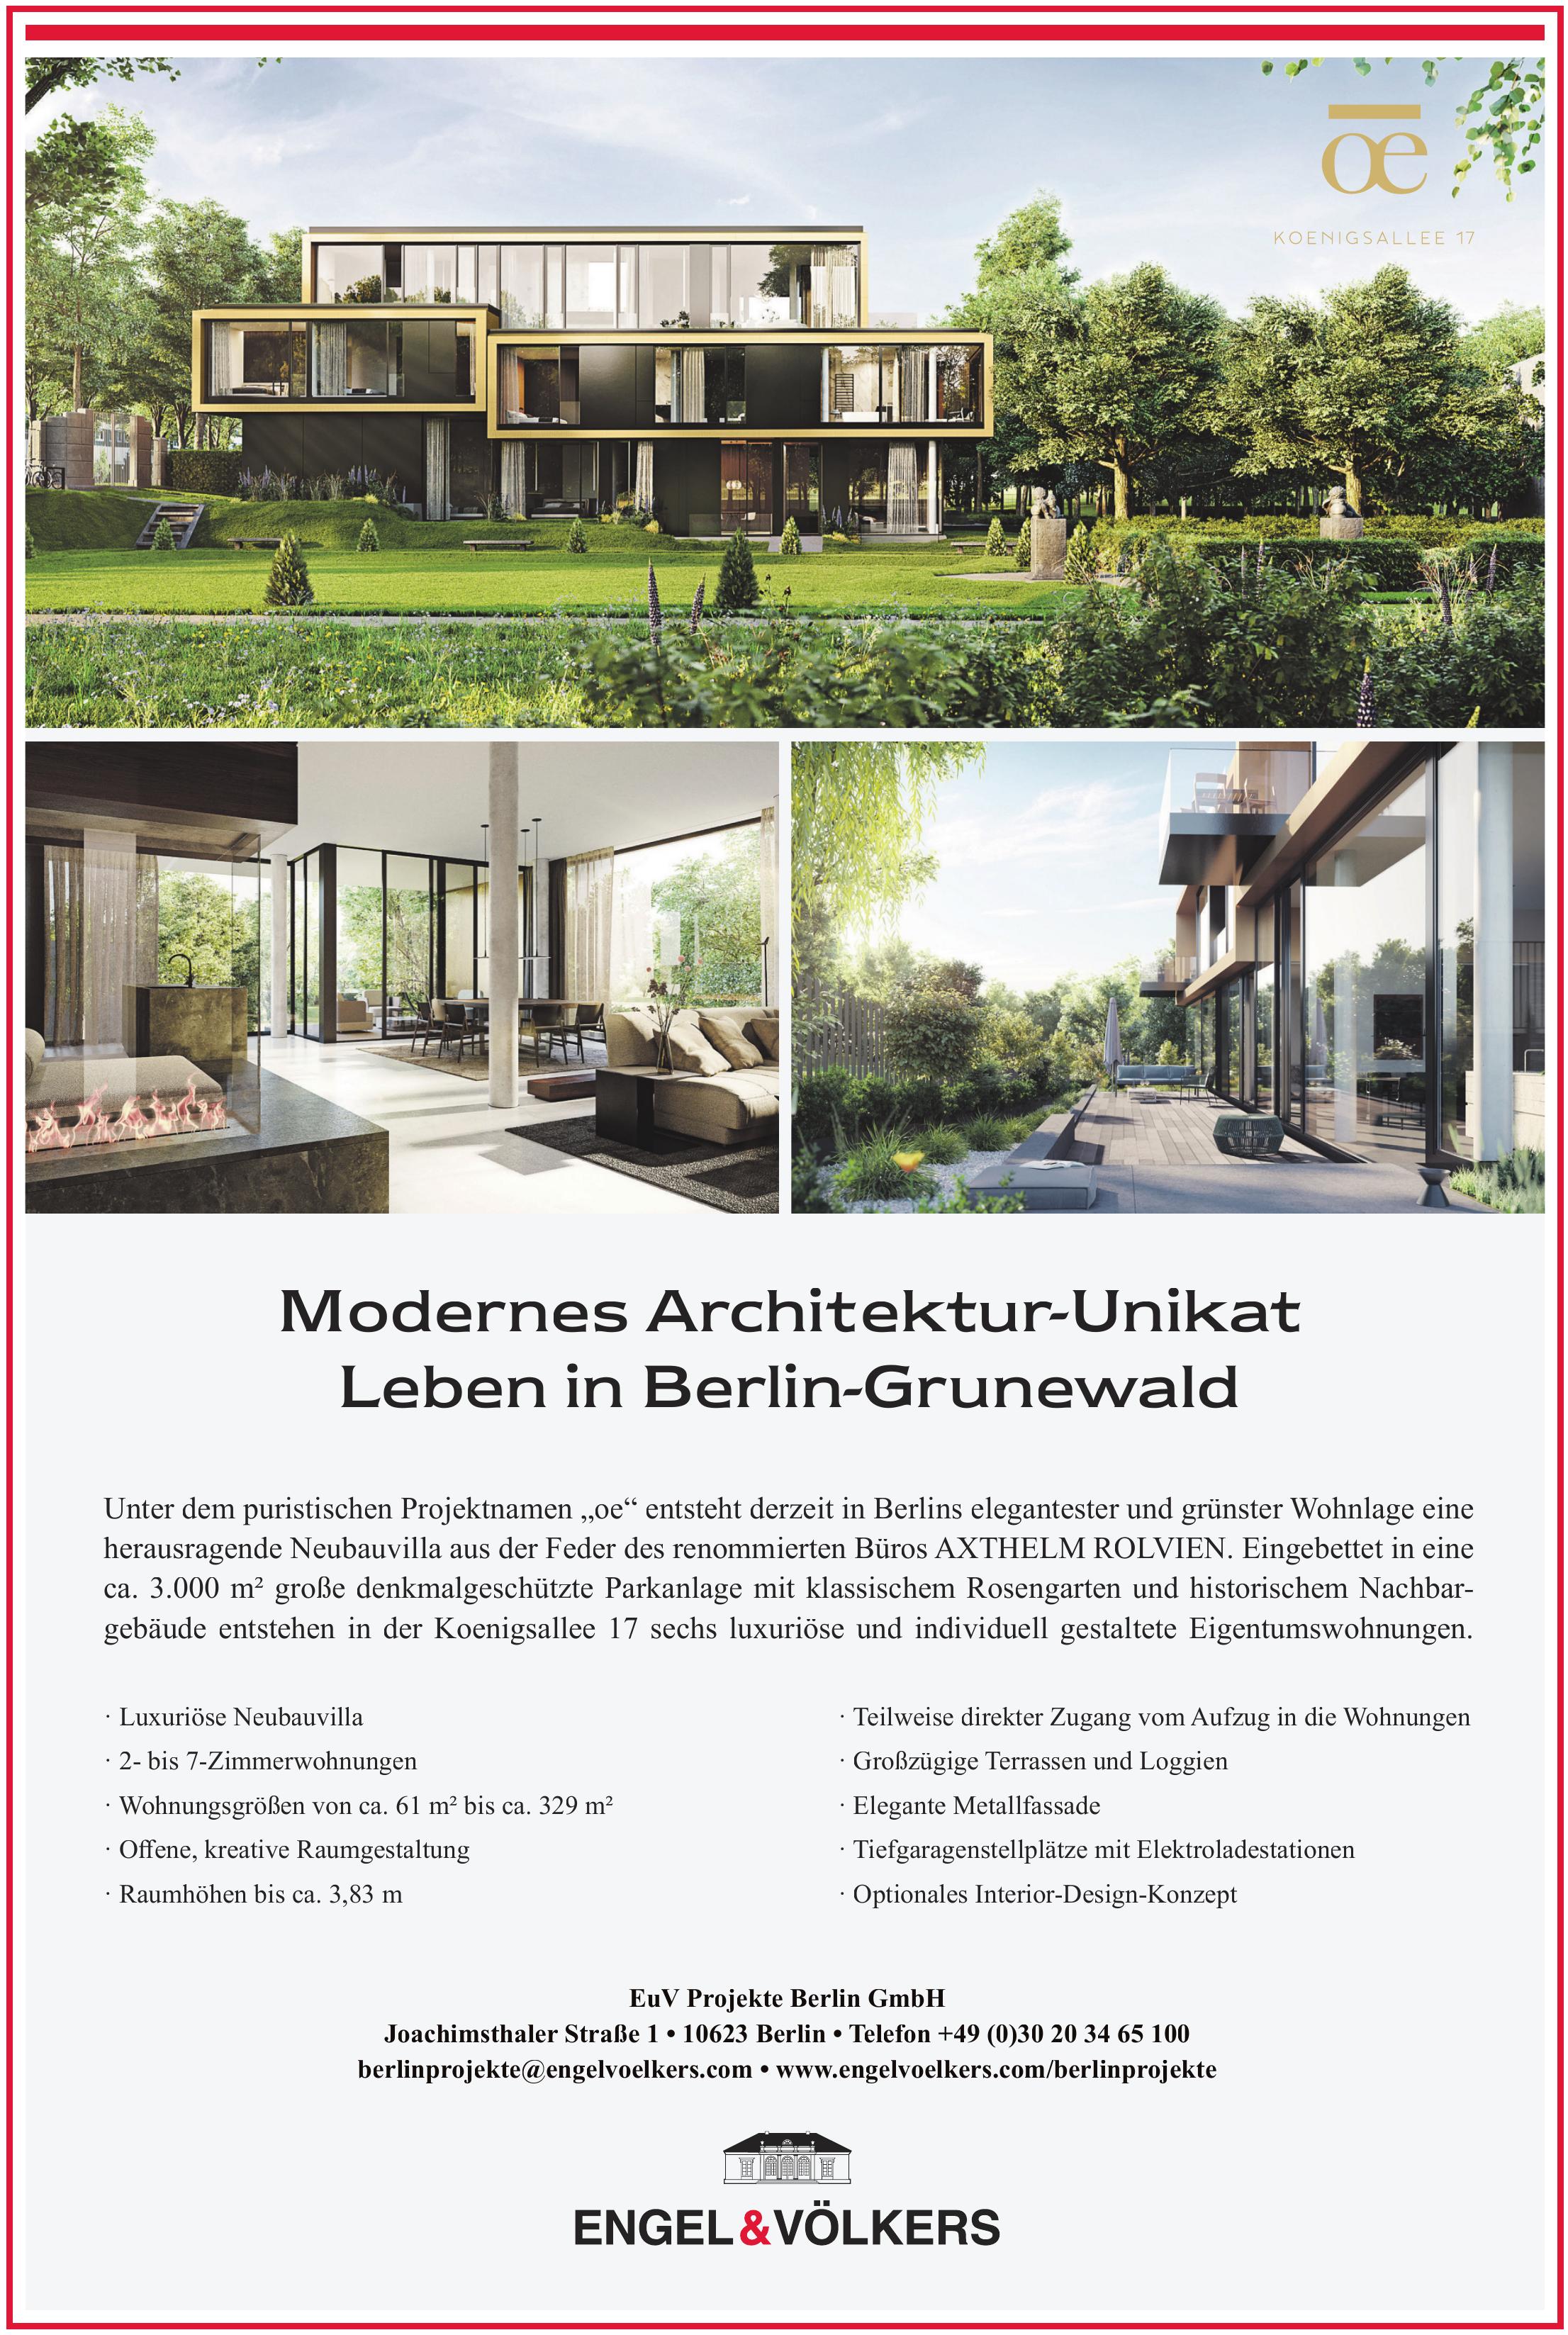 EuV Projekte Berlin GmbH